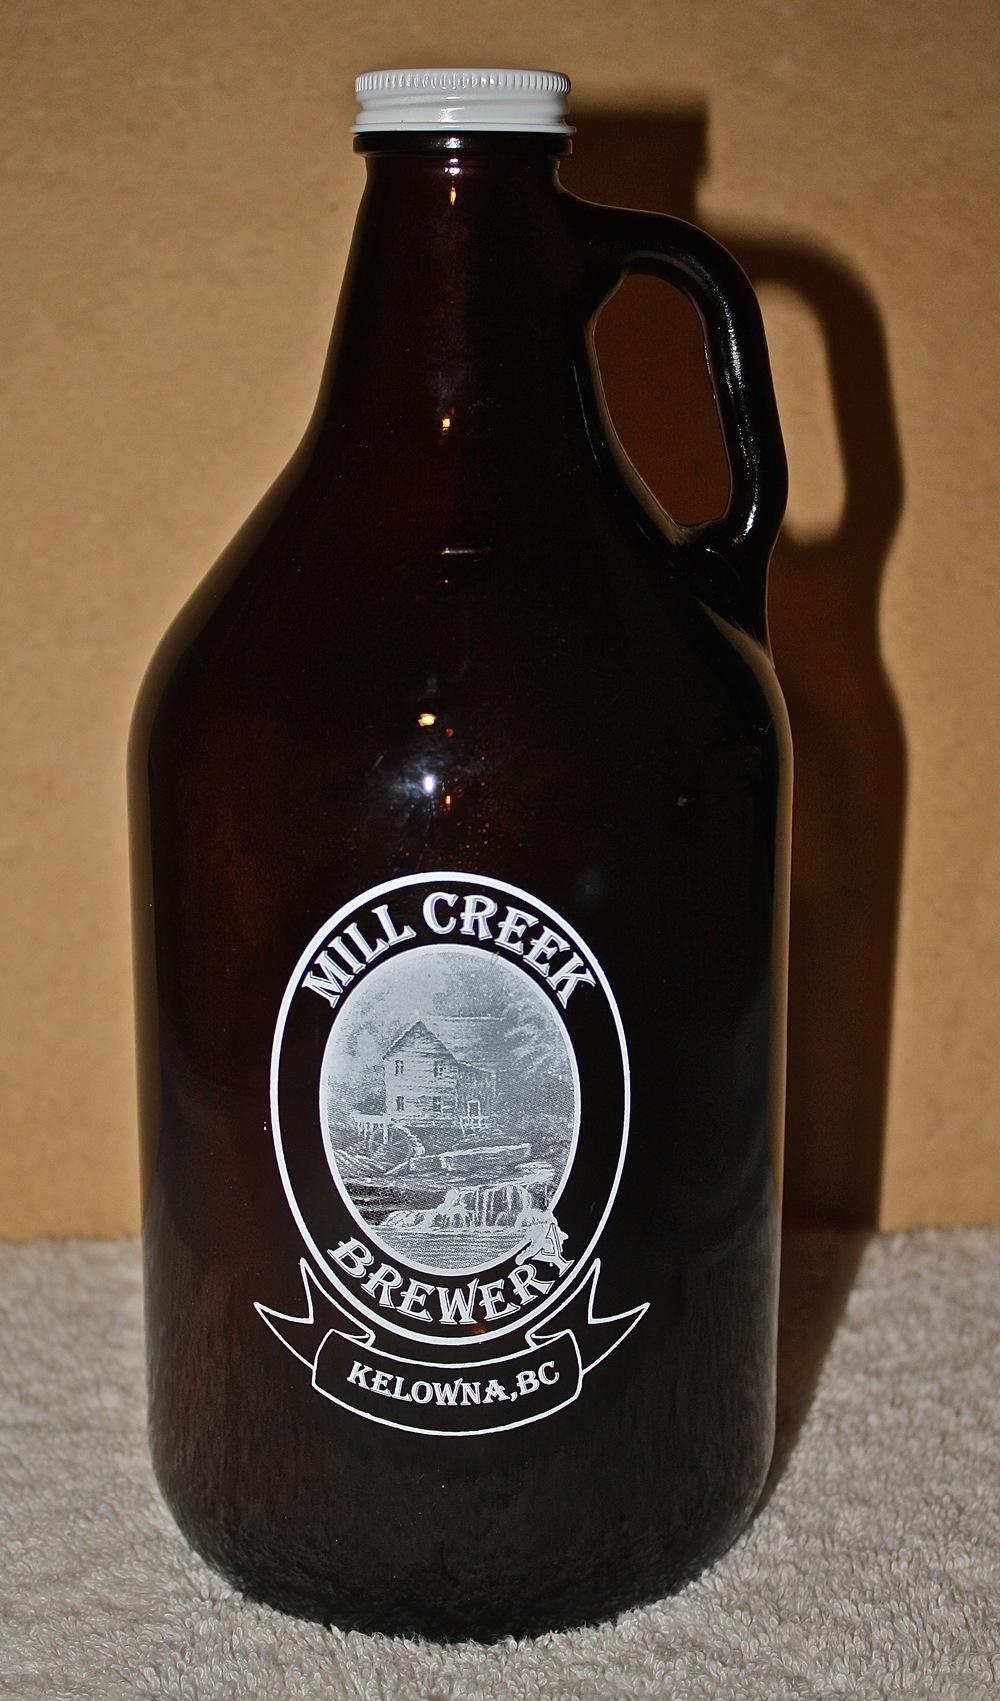 GR - Mill Creek Brewery (BC).jpg